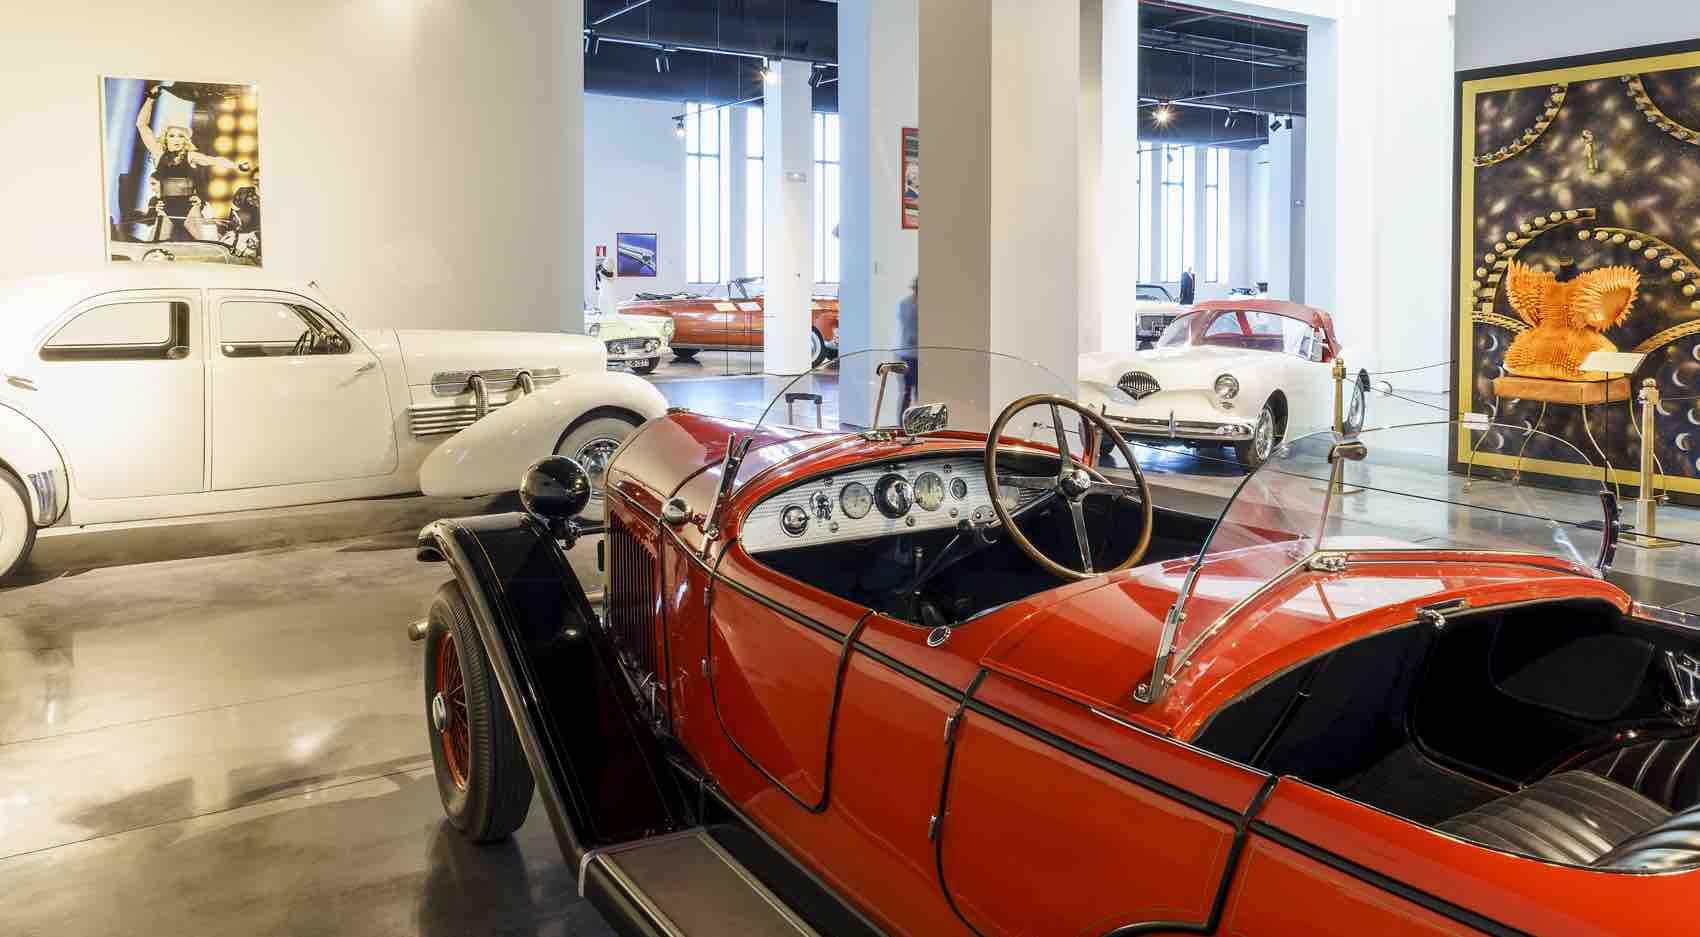 The show goes on in the car and fashion museum: Museo Automovilístico de Málaga, Address: Av de Sor Teresa Prat, 15